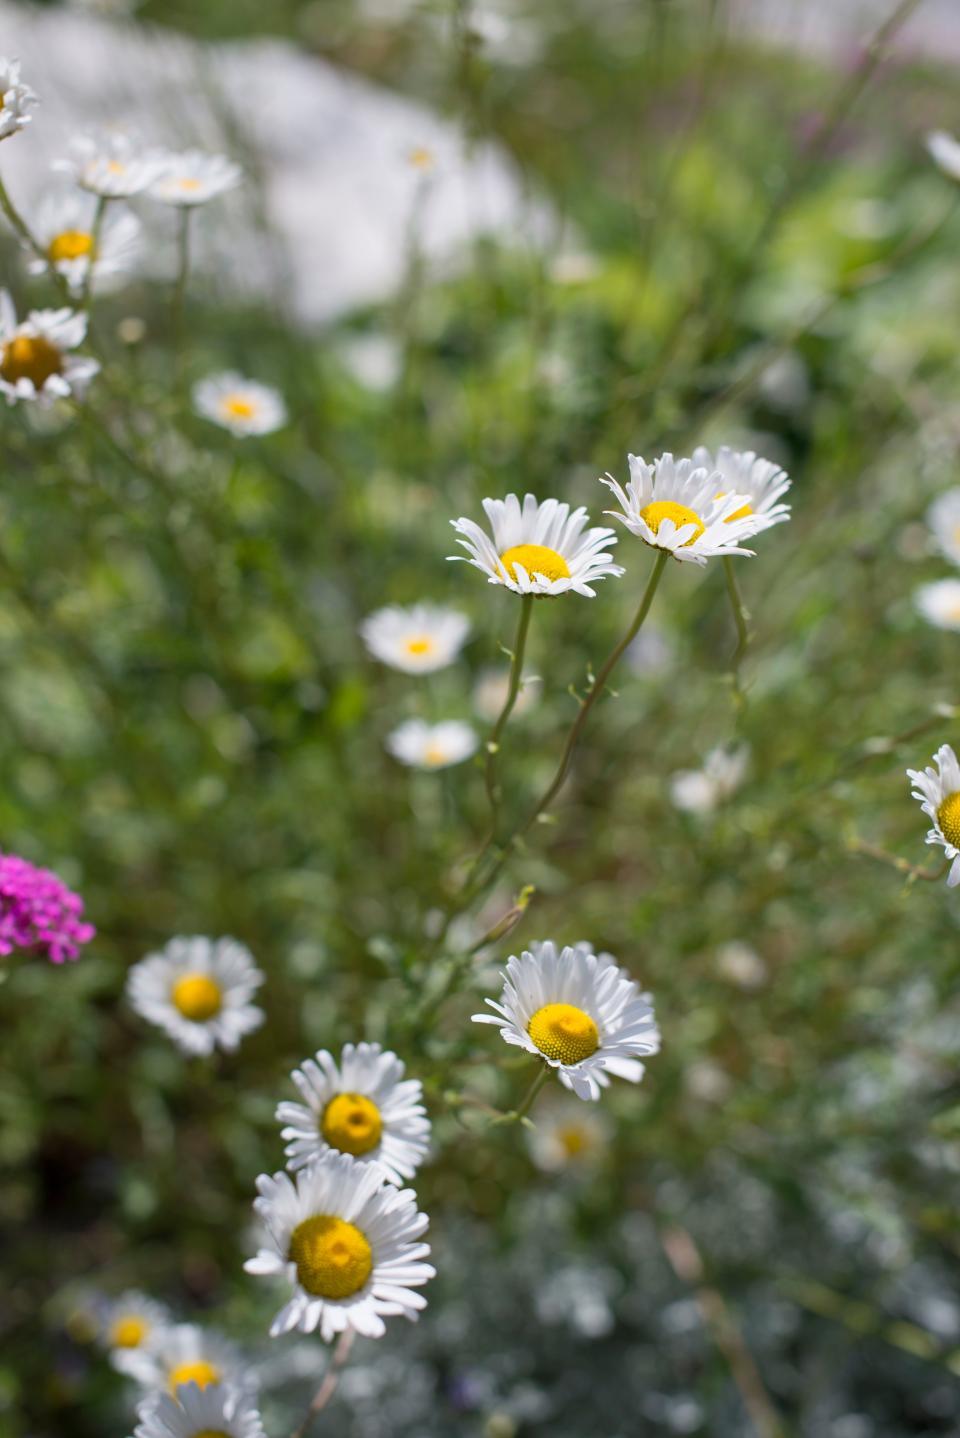 flower, white, petal, garden, plant, nature, blur